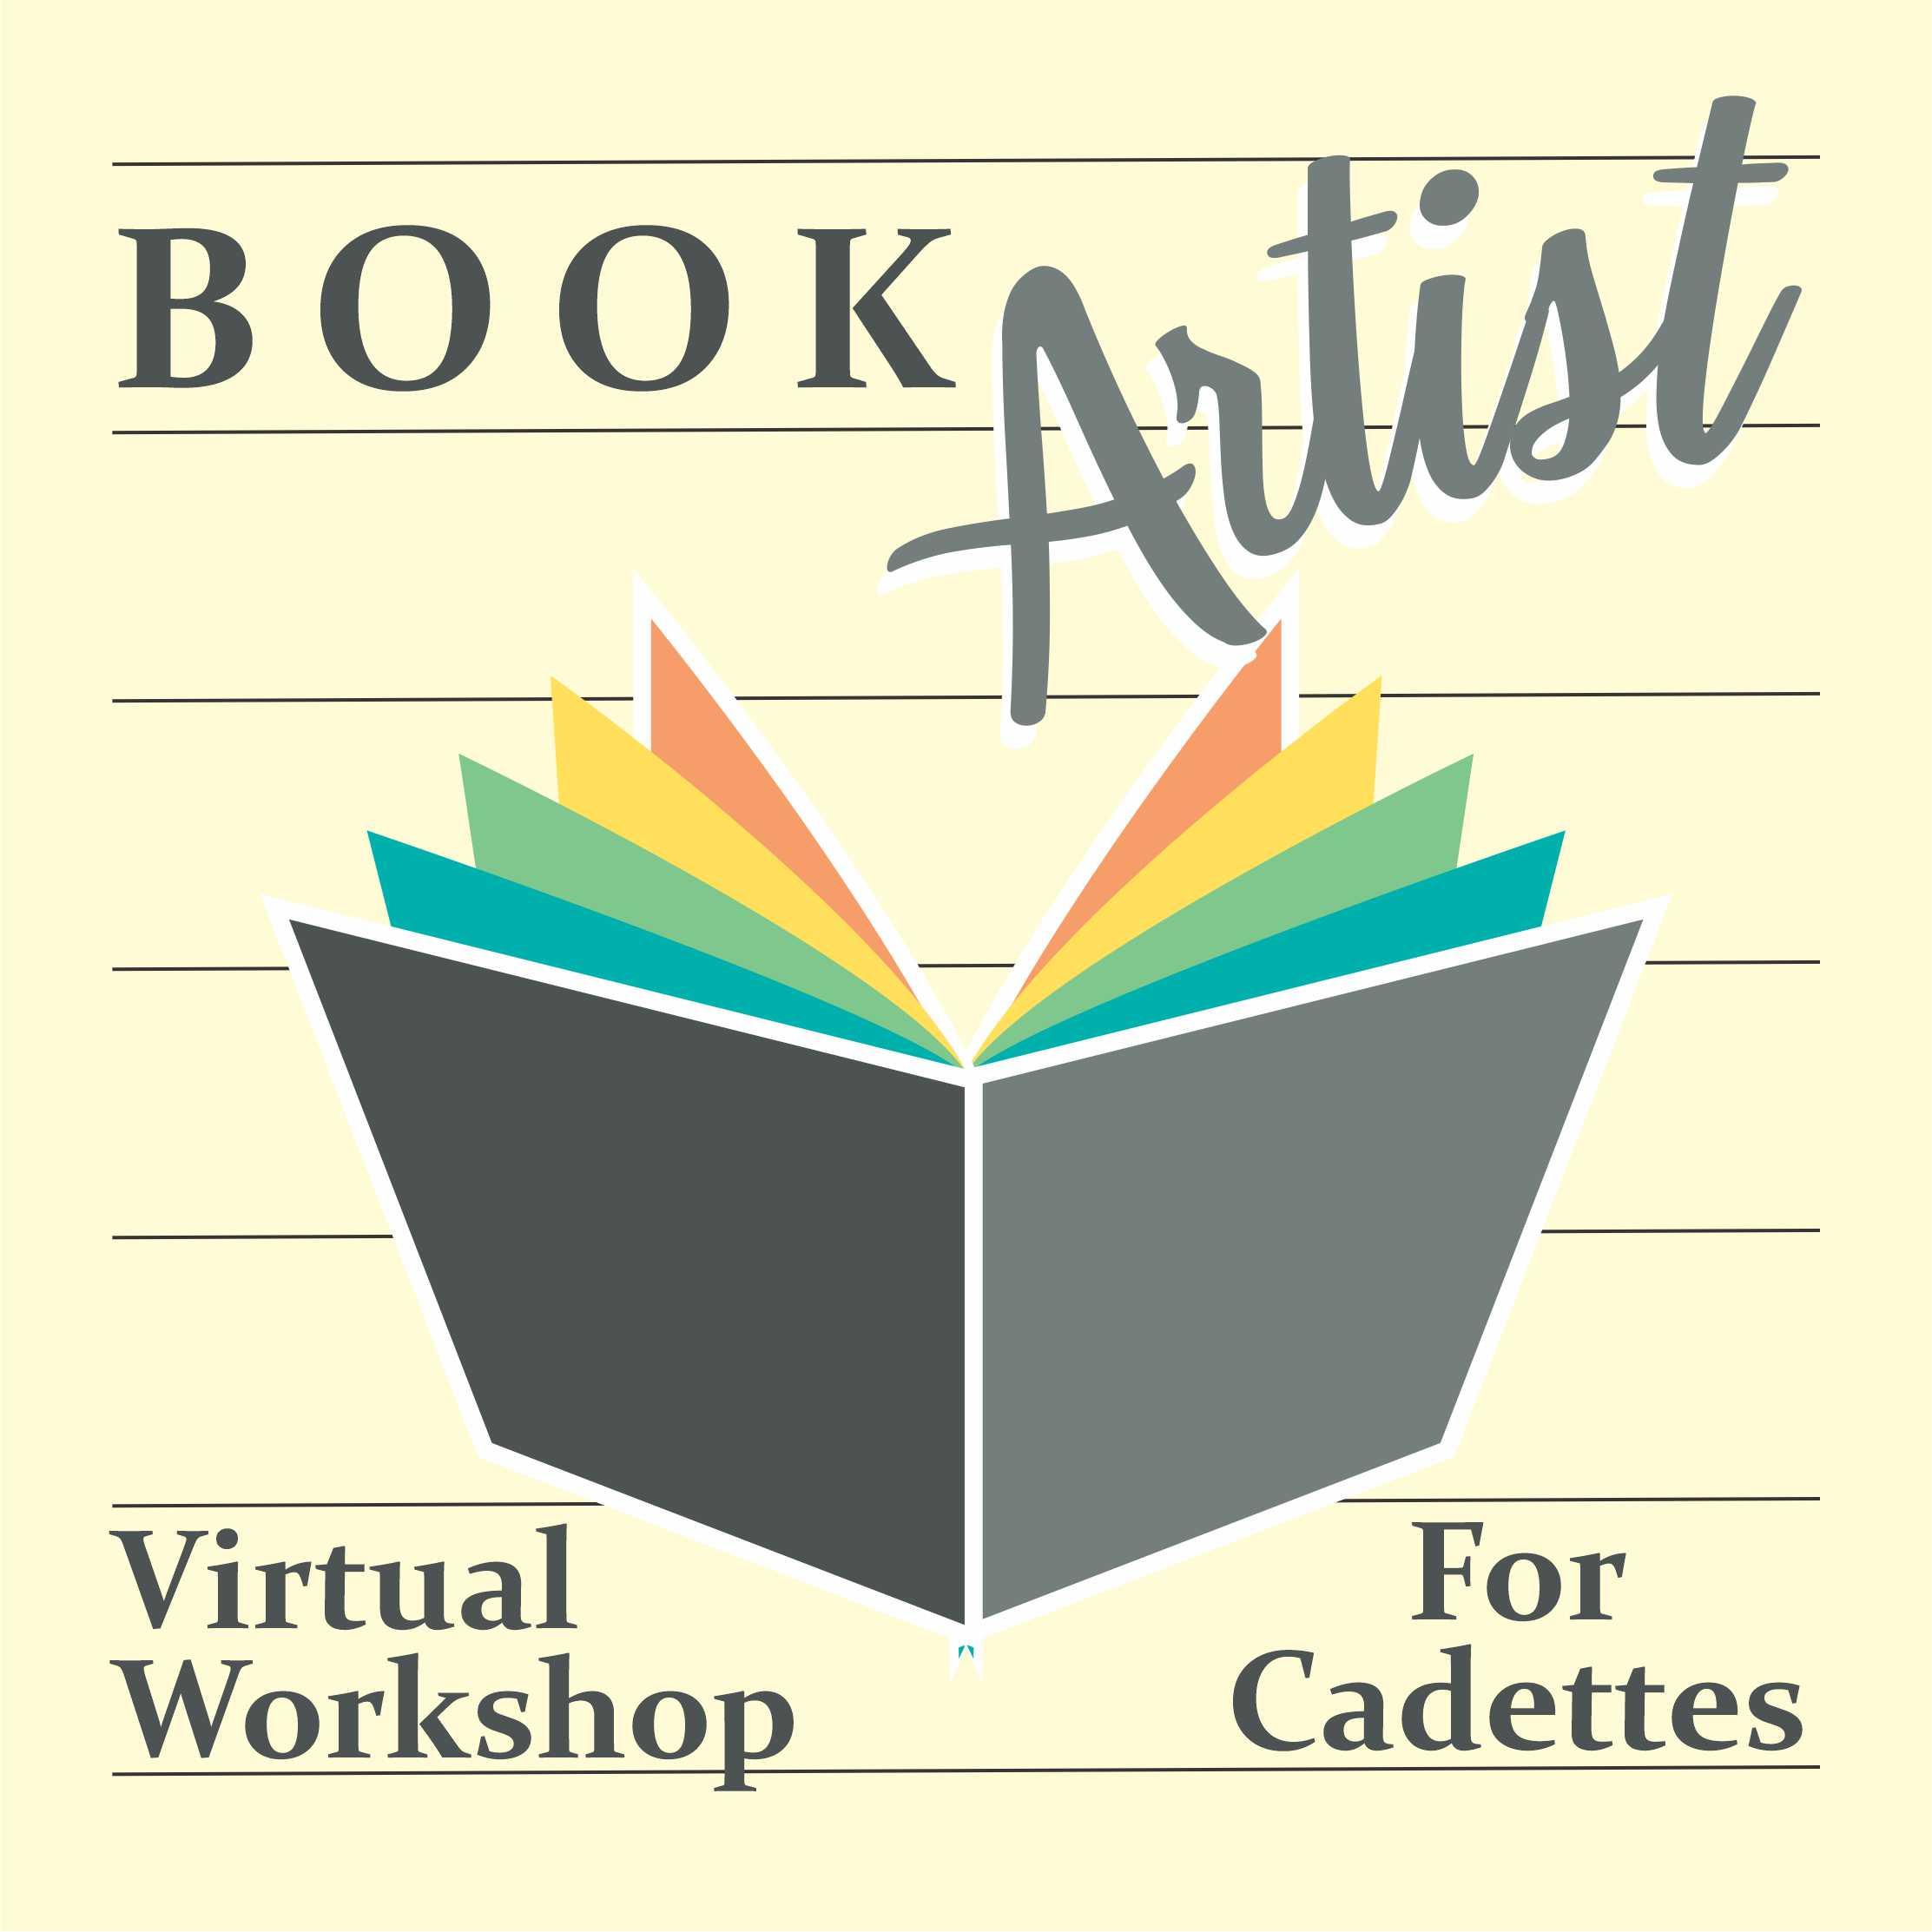 Girl Scout Book Artist Virtual Workshop for Cadettes